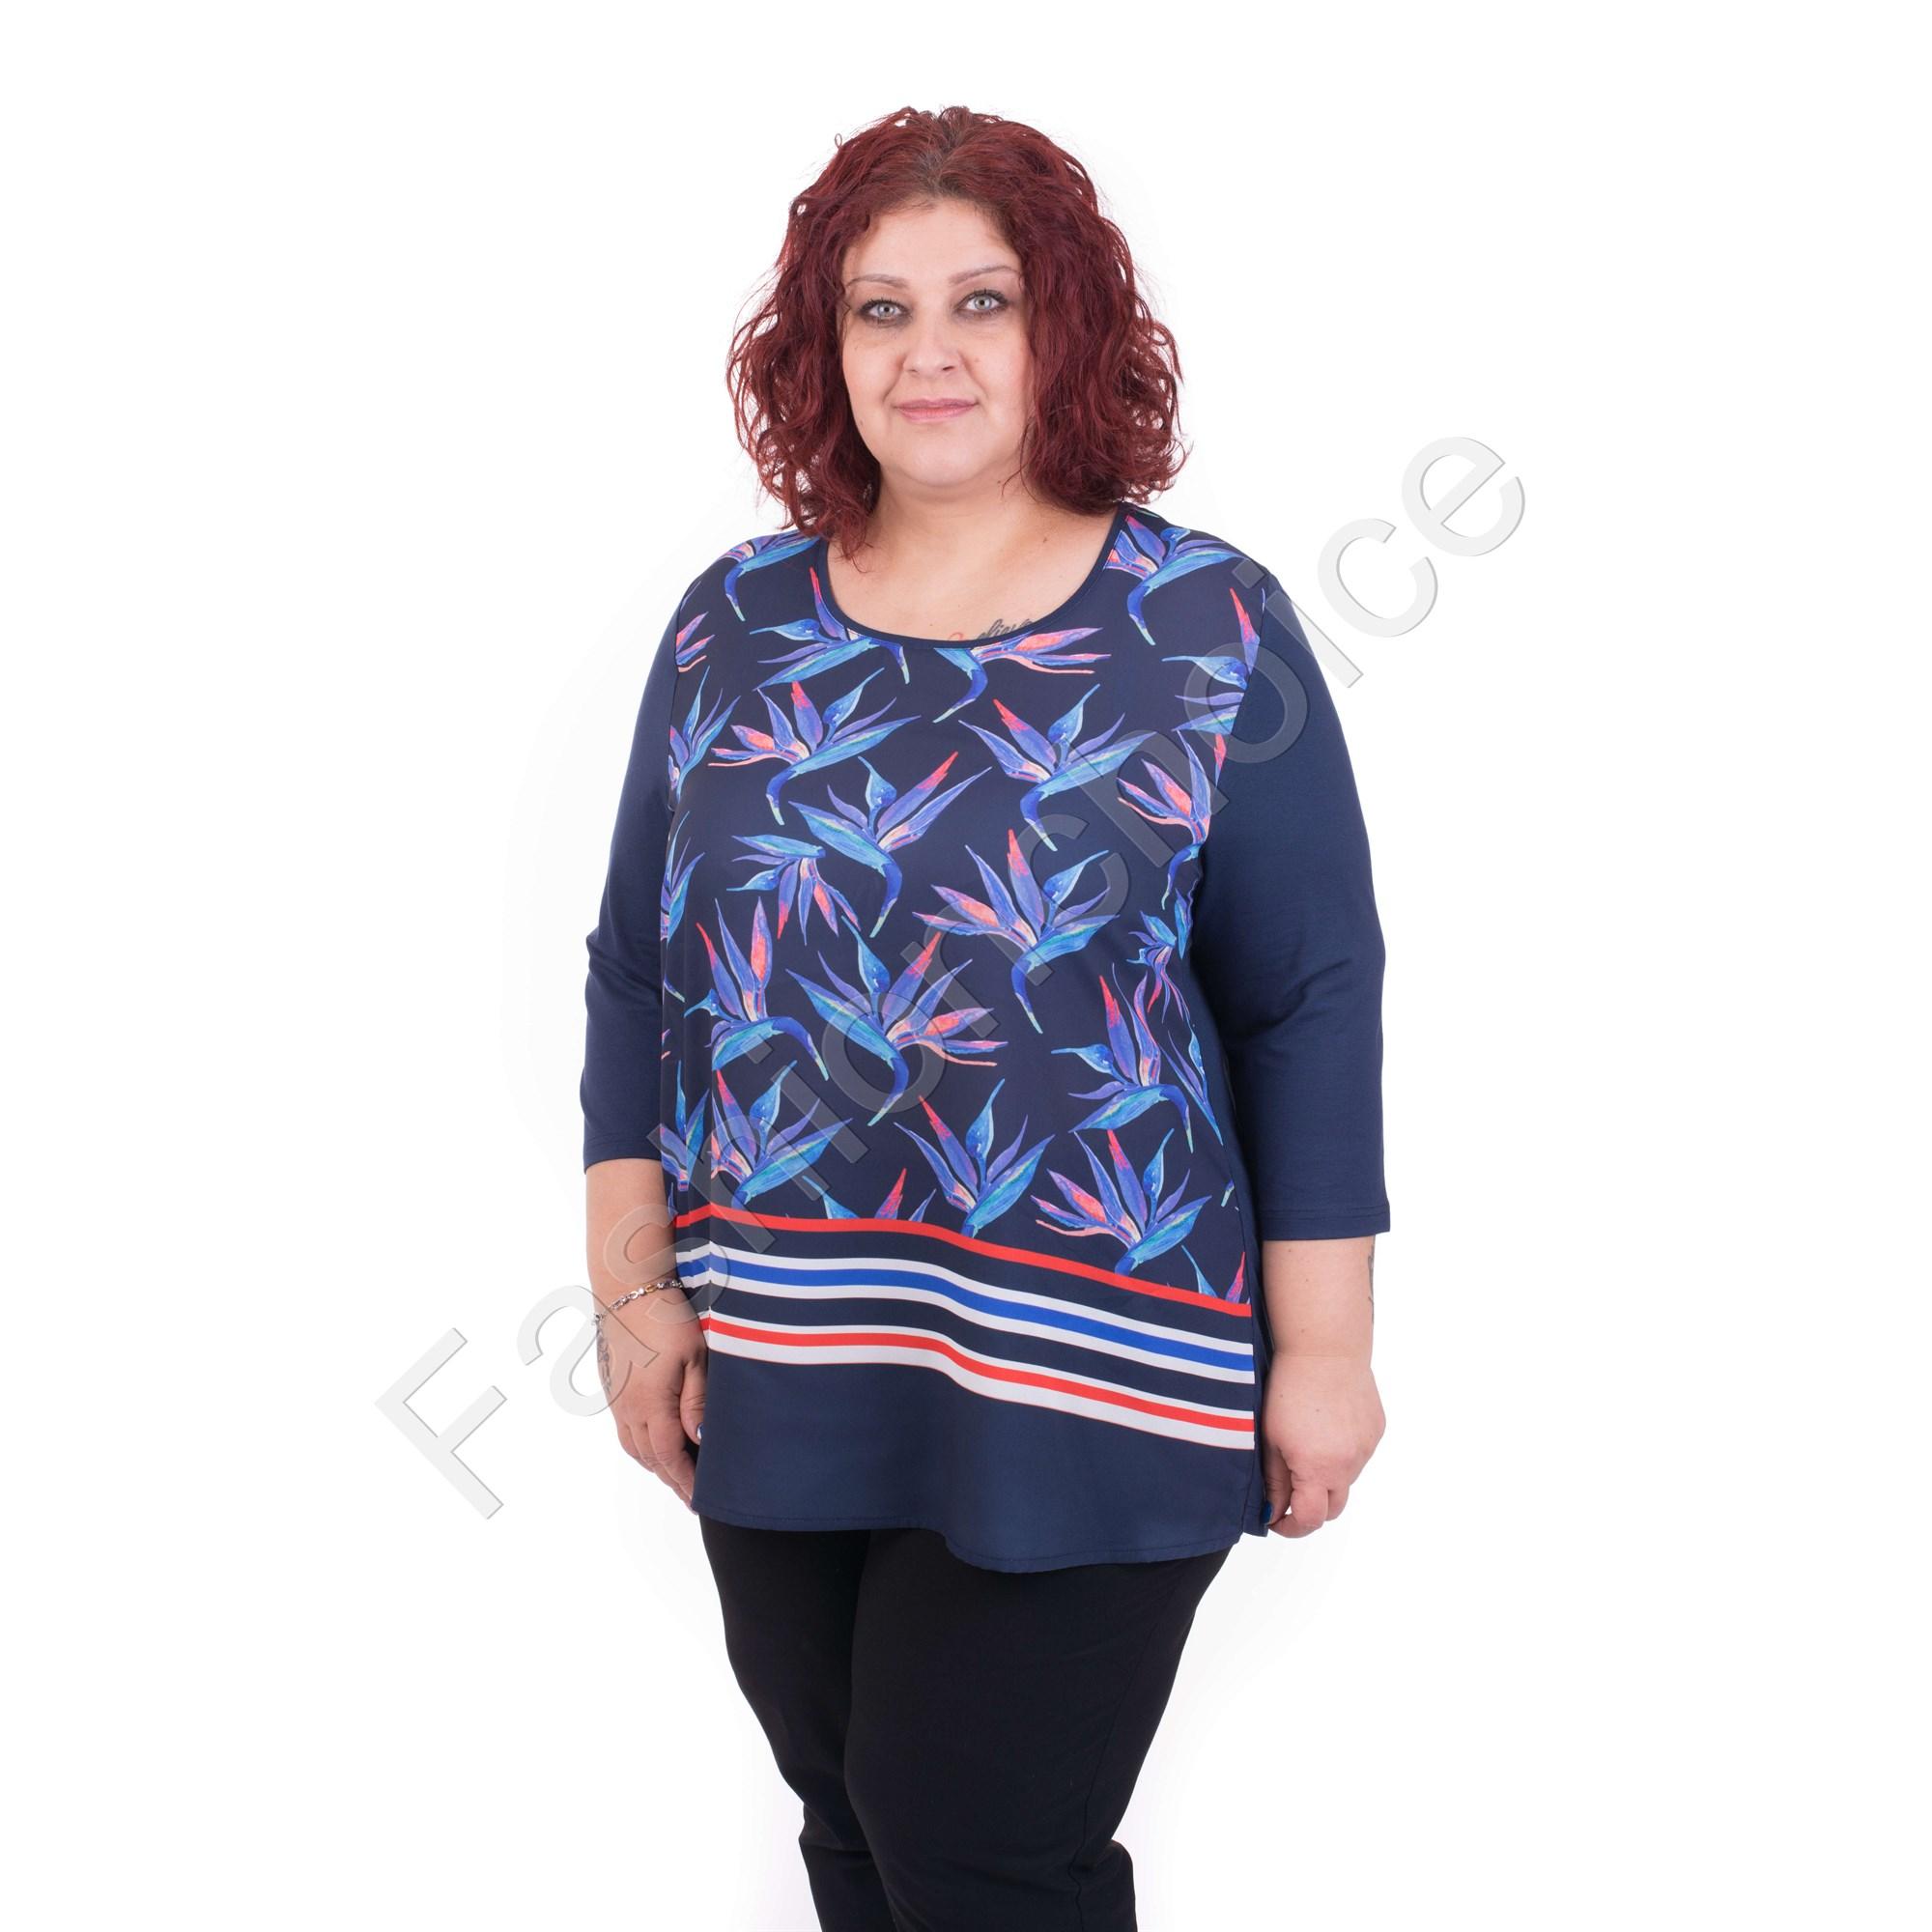 c753adfe0ea9 Κομψή γυναικεία maxi μπλούζα με floral σχέδια